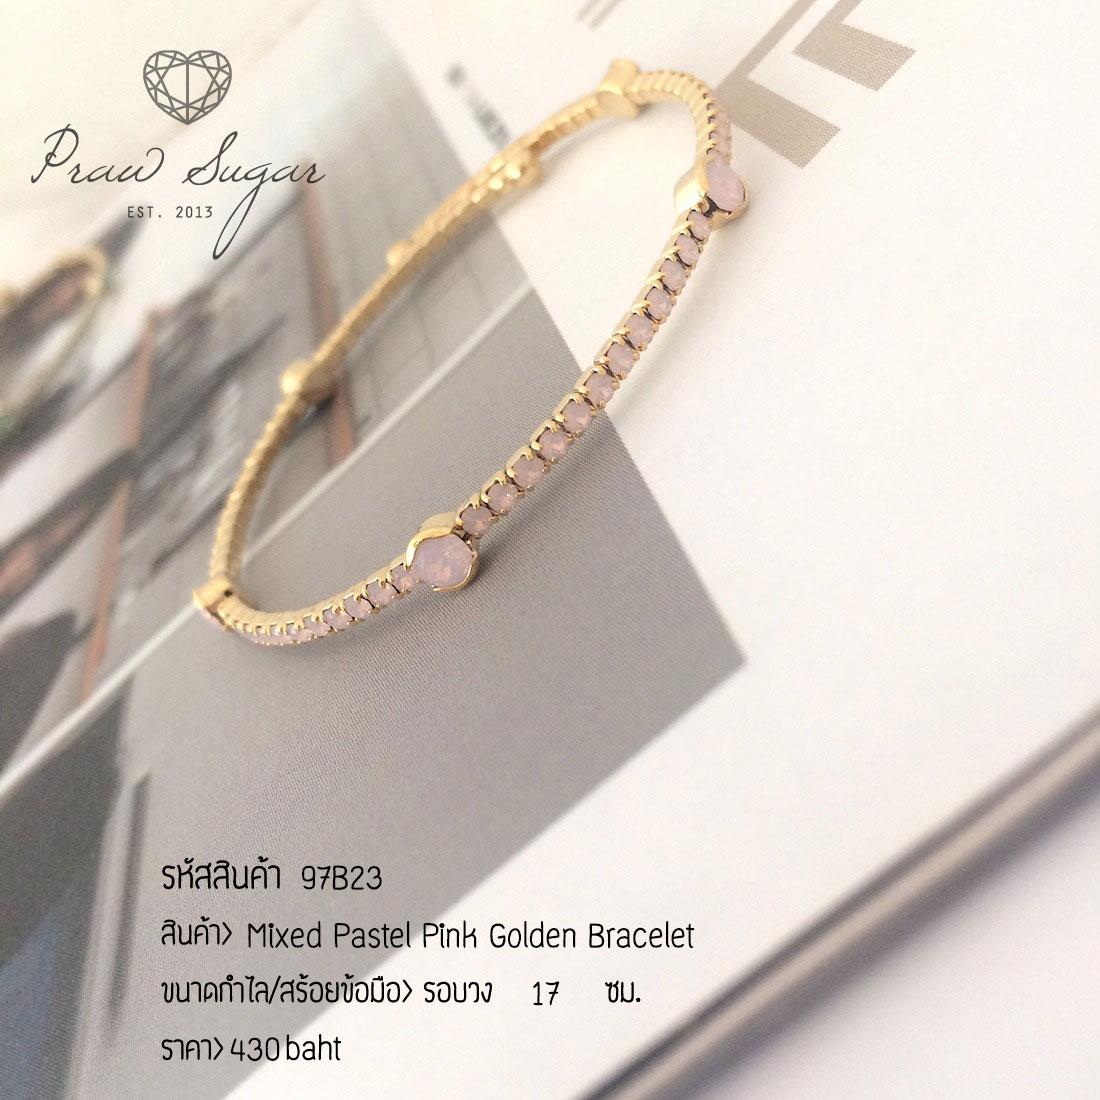 Mixed Pastel Pink Golden Bracelet